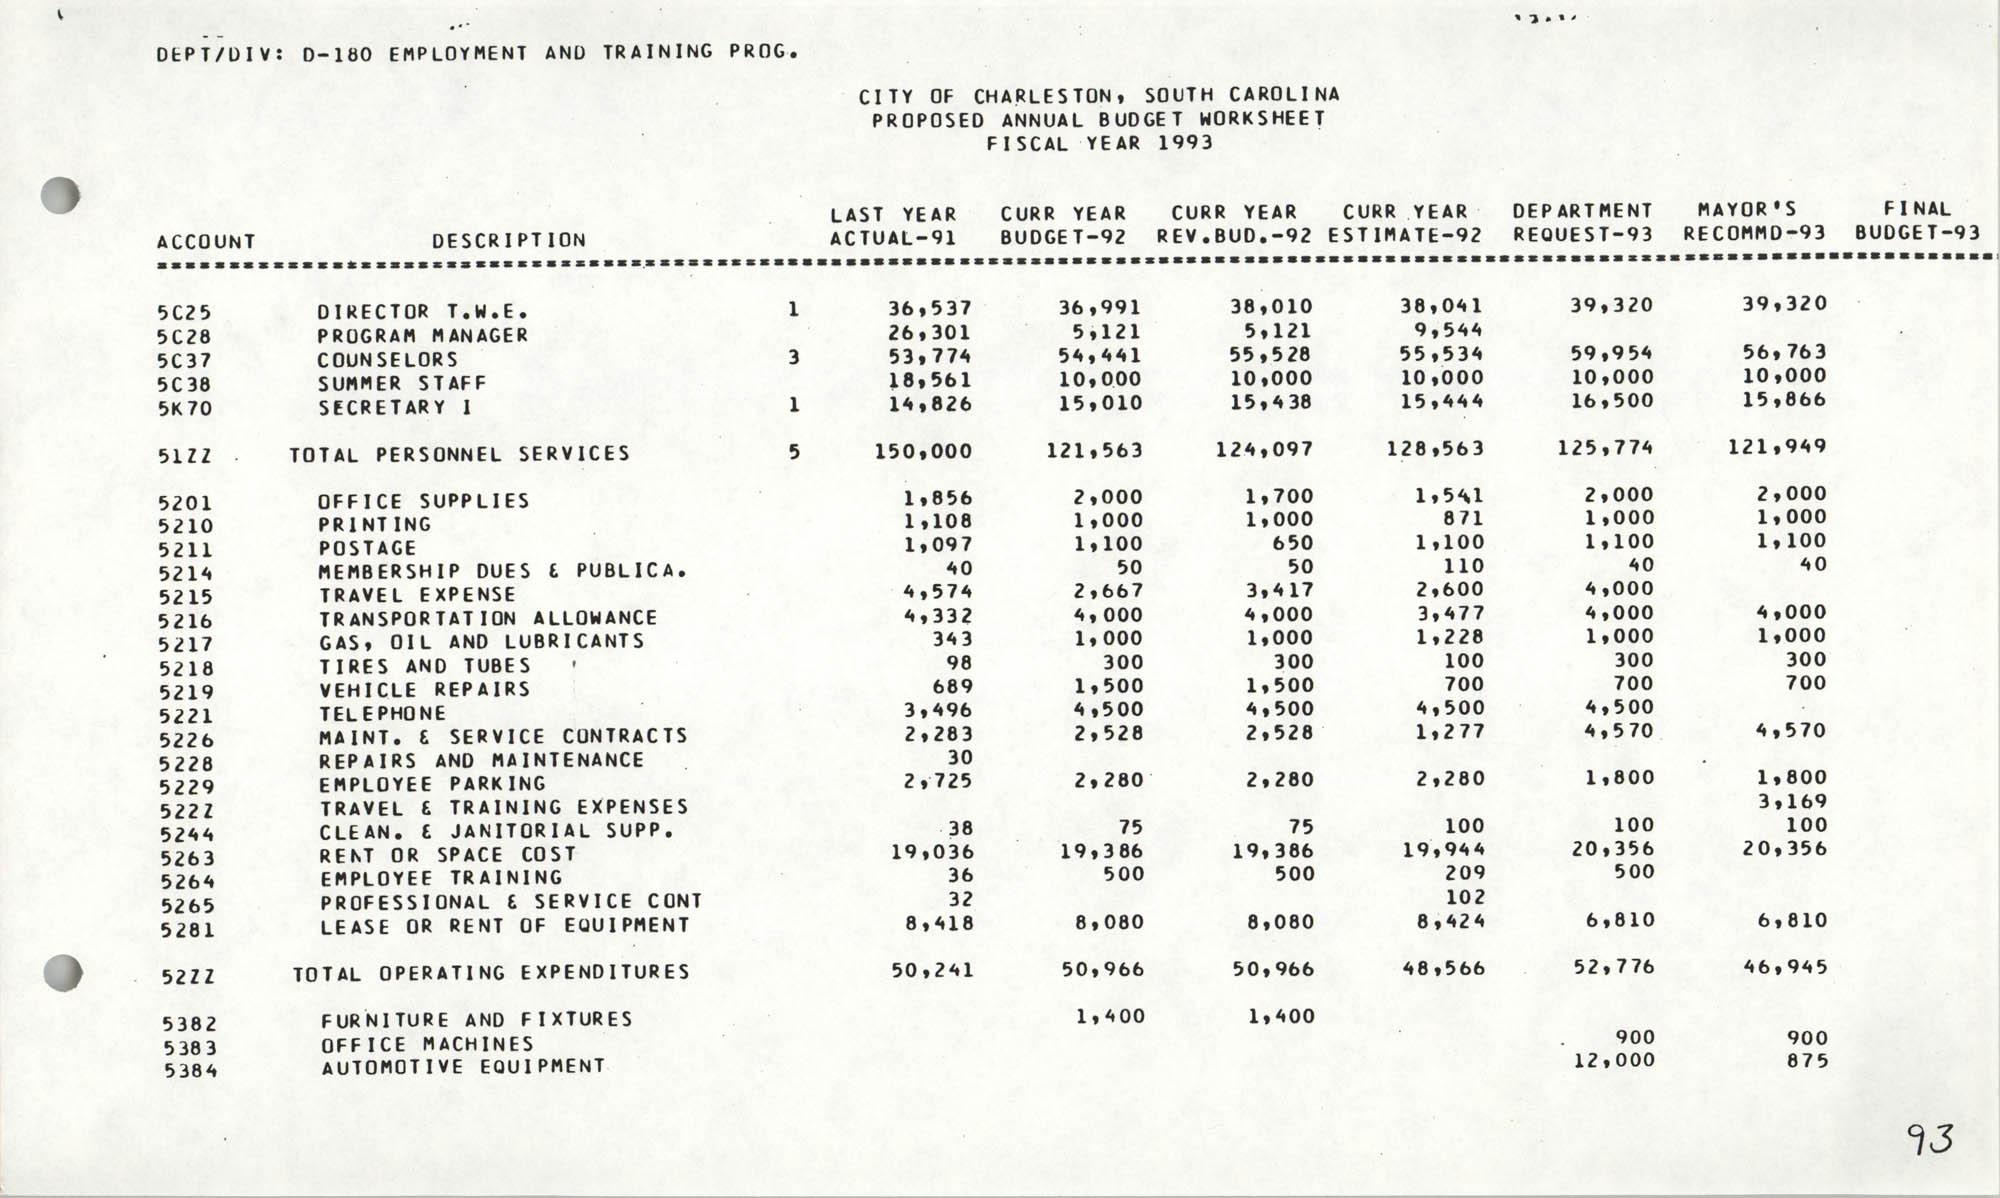 The City Council of Charleston, South Carolina, 1993 Budget, Page 93